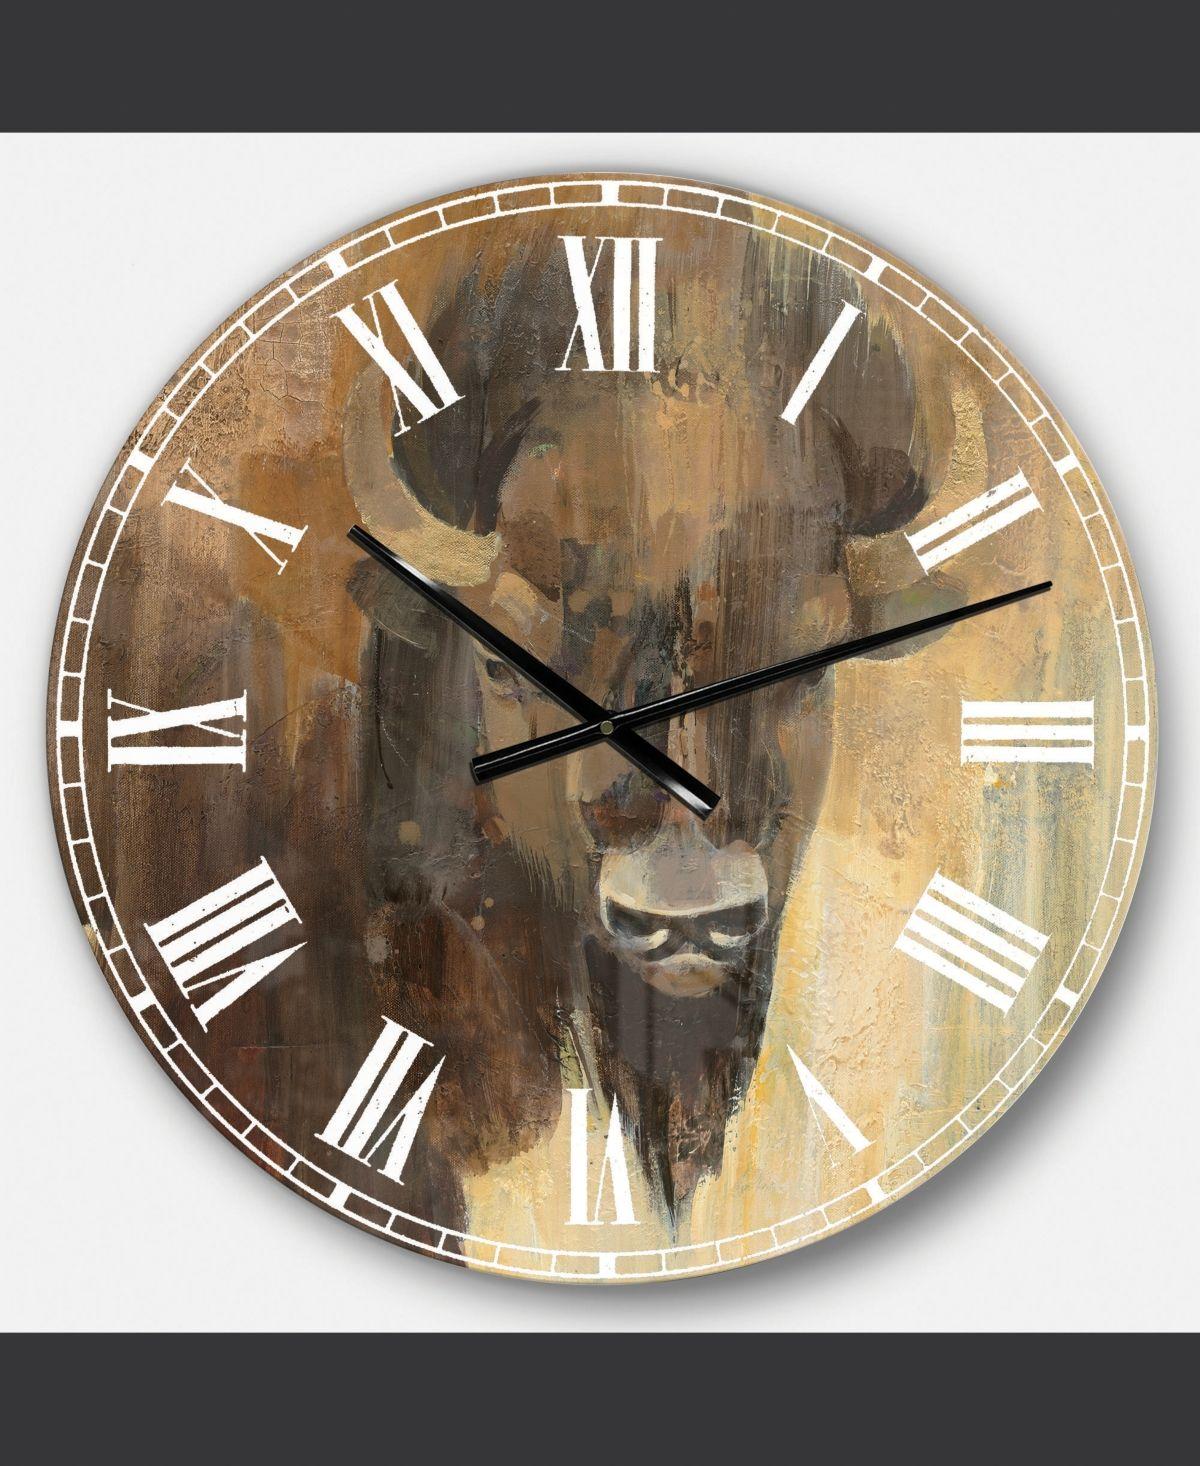 Designart Modern Farmhouse Oversized Metal Wall Clock Reviews Clocks Home Decor Macy S Metal Wall Clock Wall Clock Clock